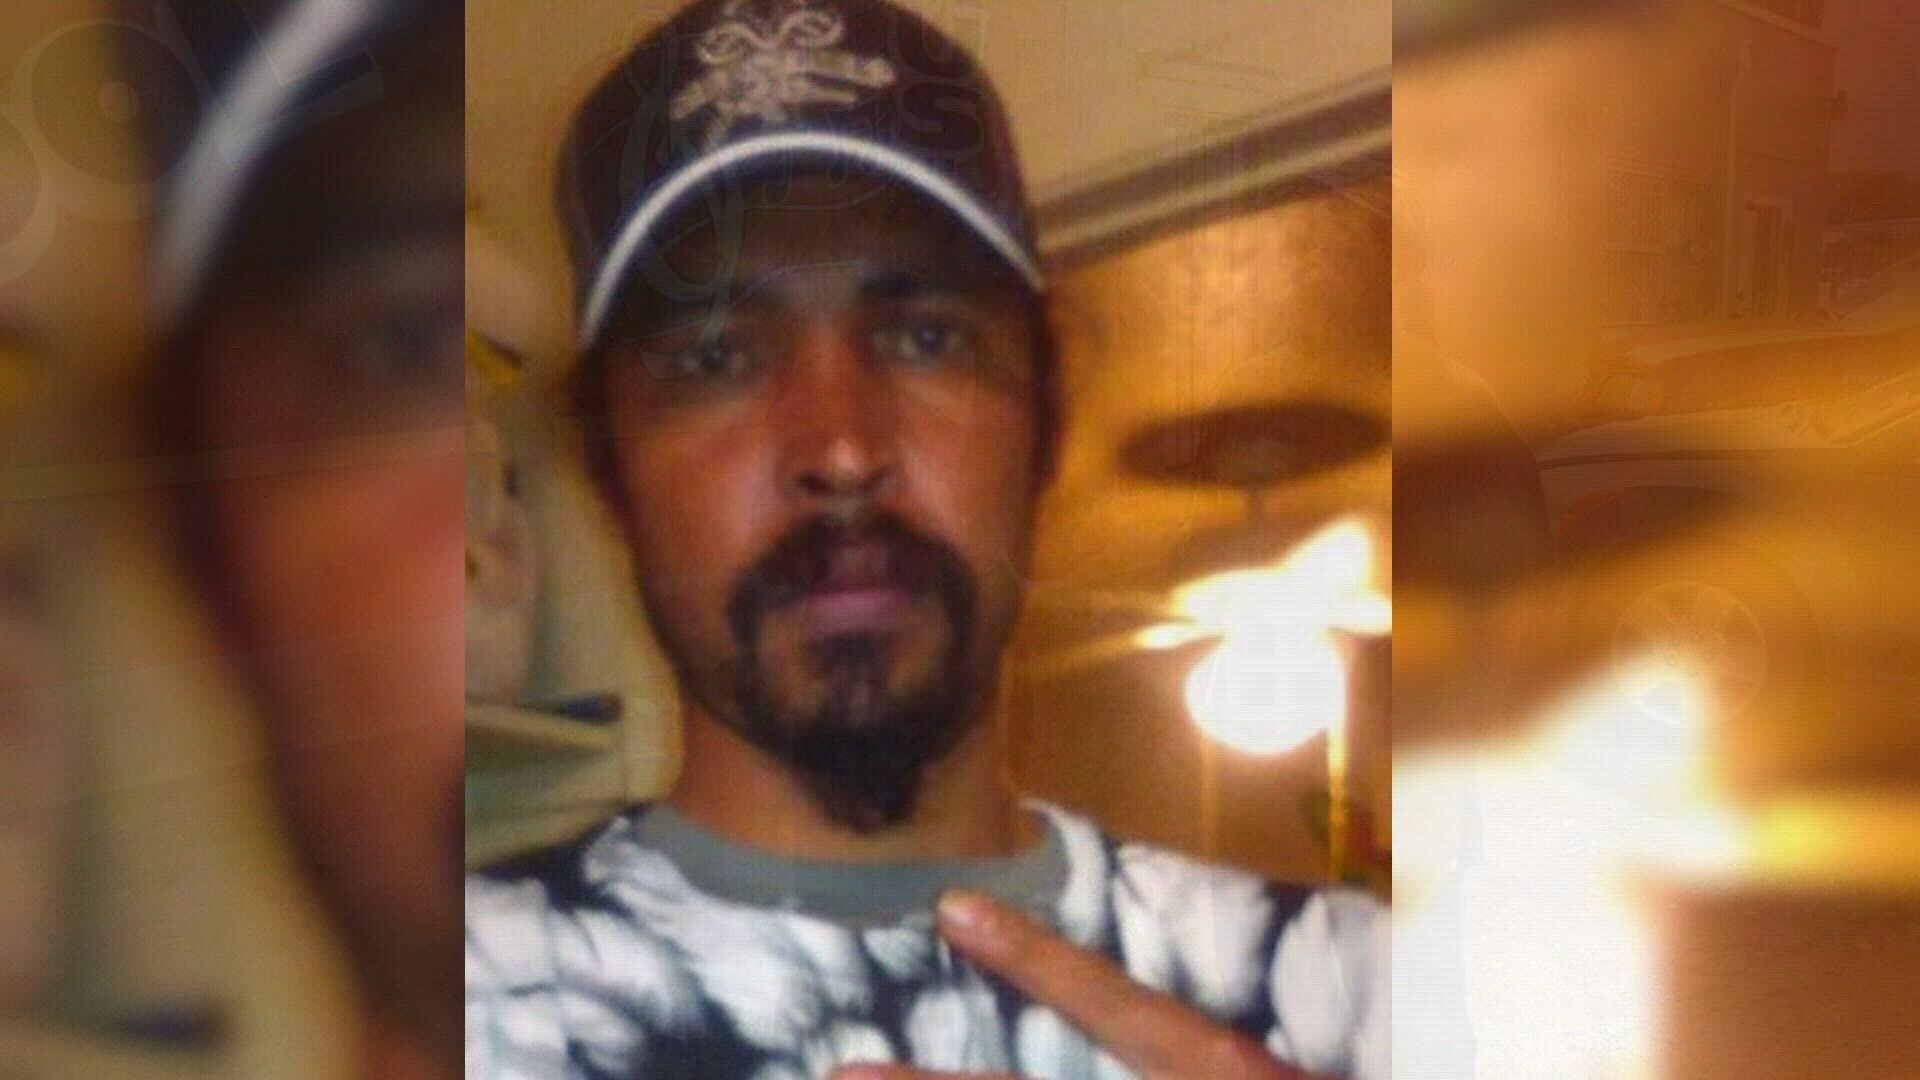 Santos Bonilla was killed outside of El Rincon bar on Ayers Street last November.